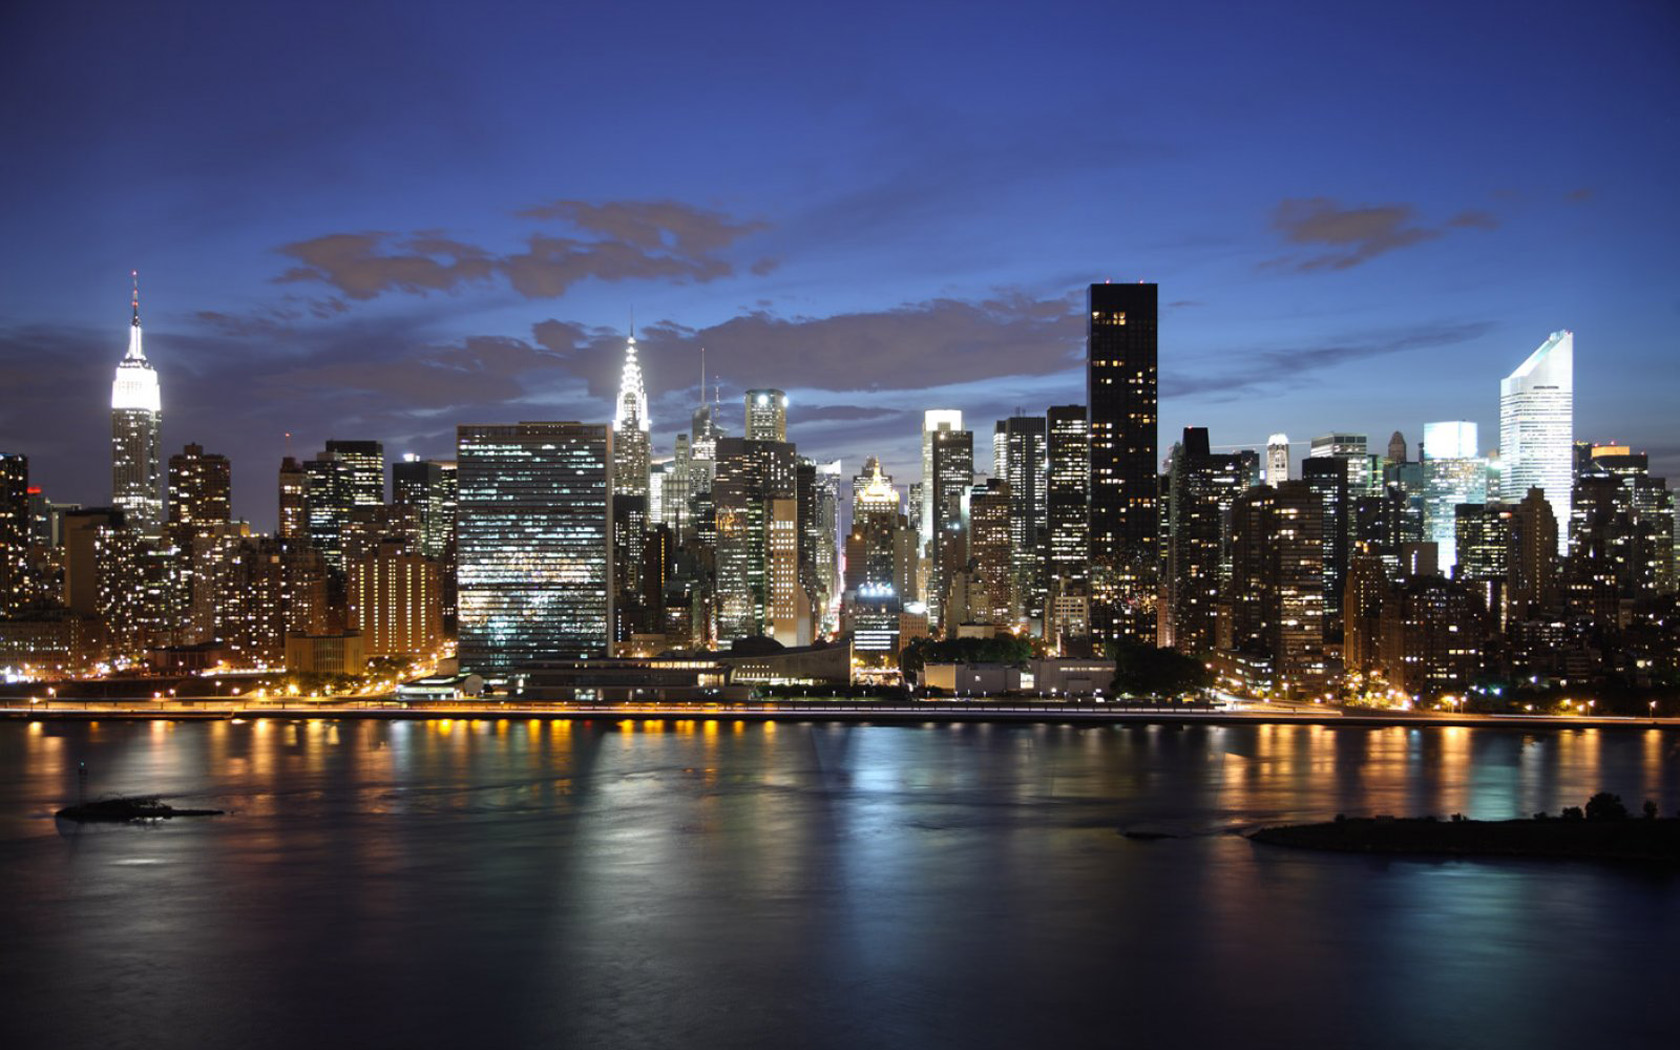 New York Skyline Night Wallpaper 1680x1050 pixel City HD Wallpaper 1680x1050